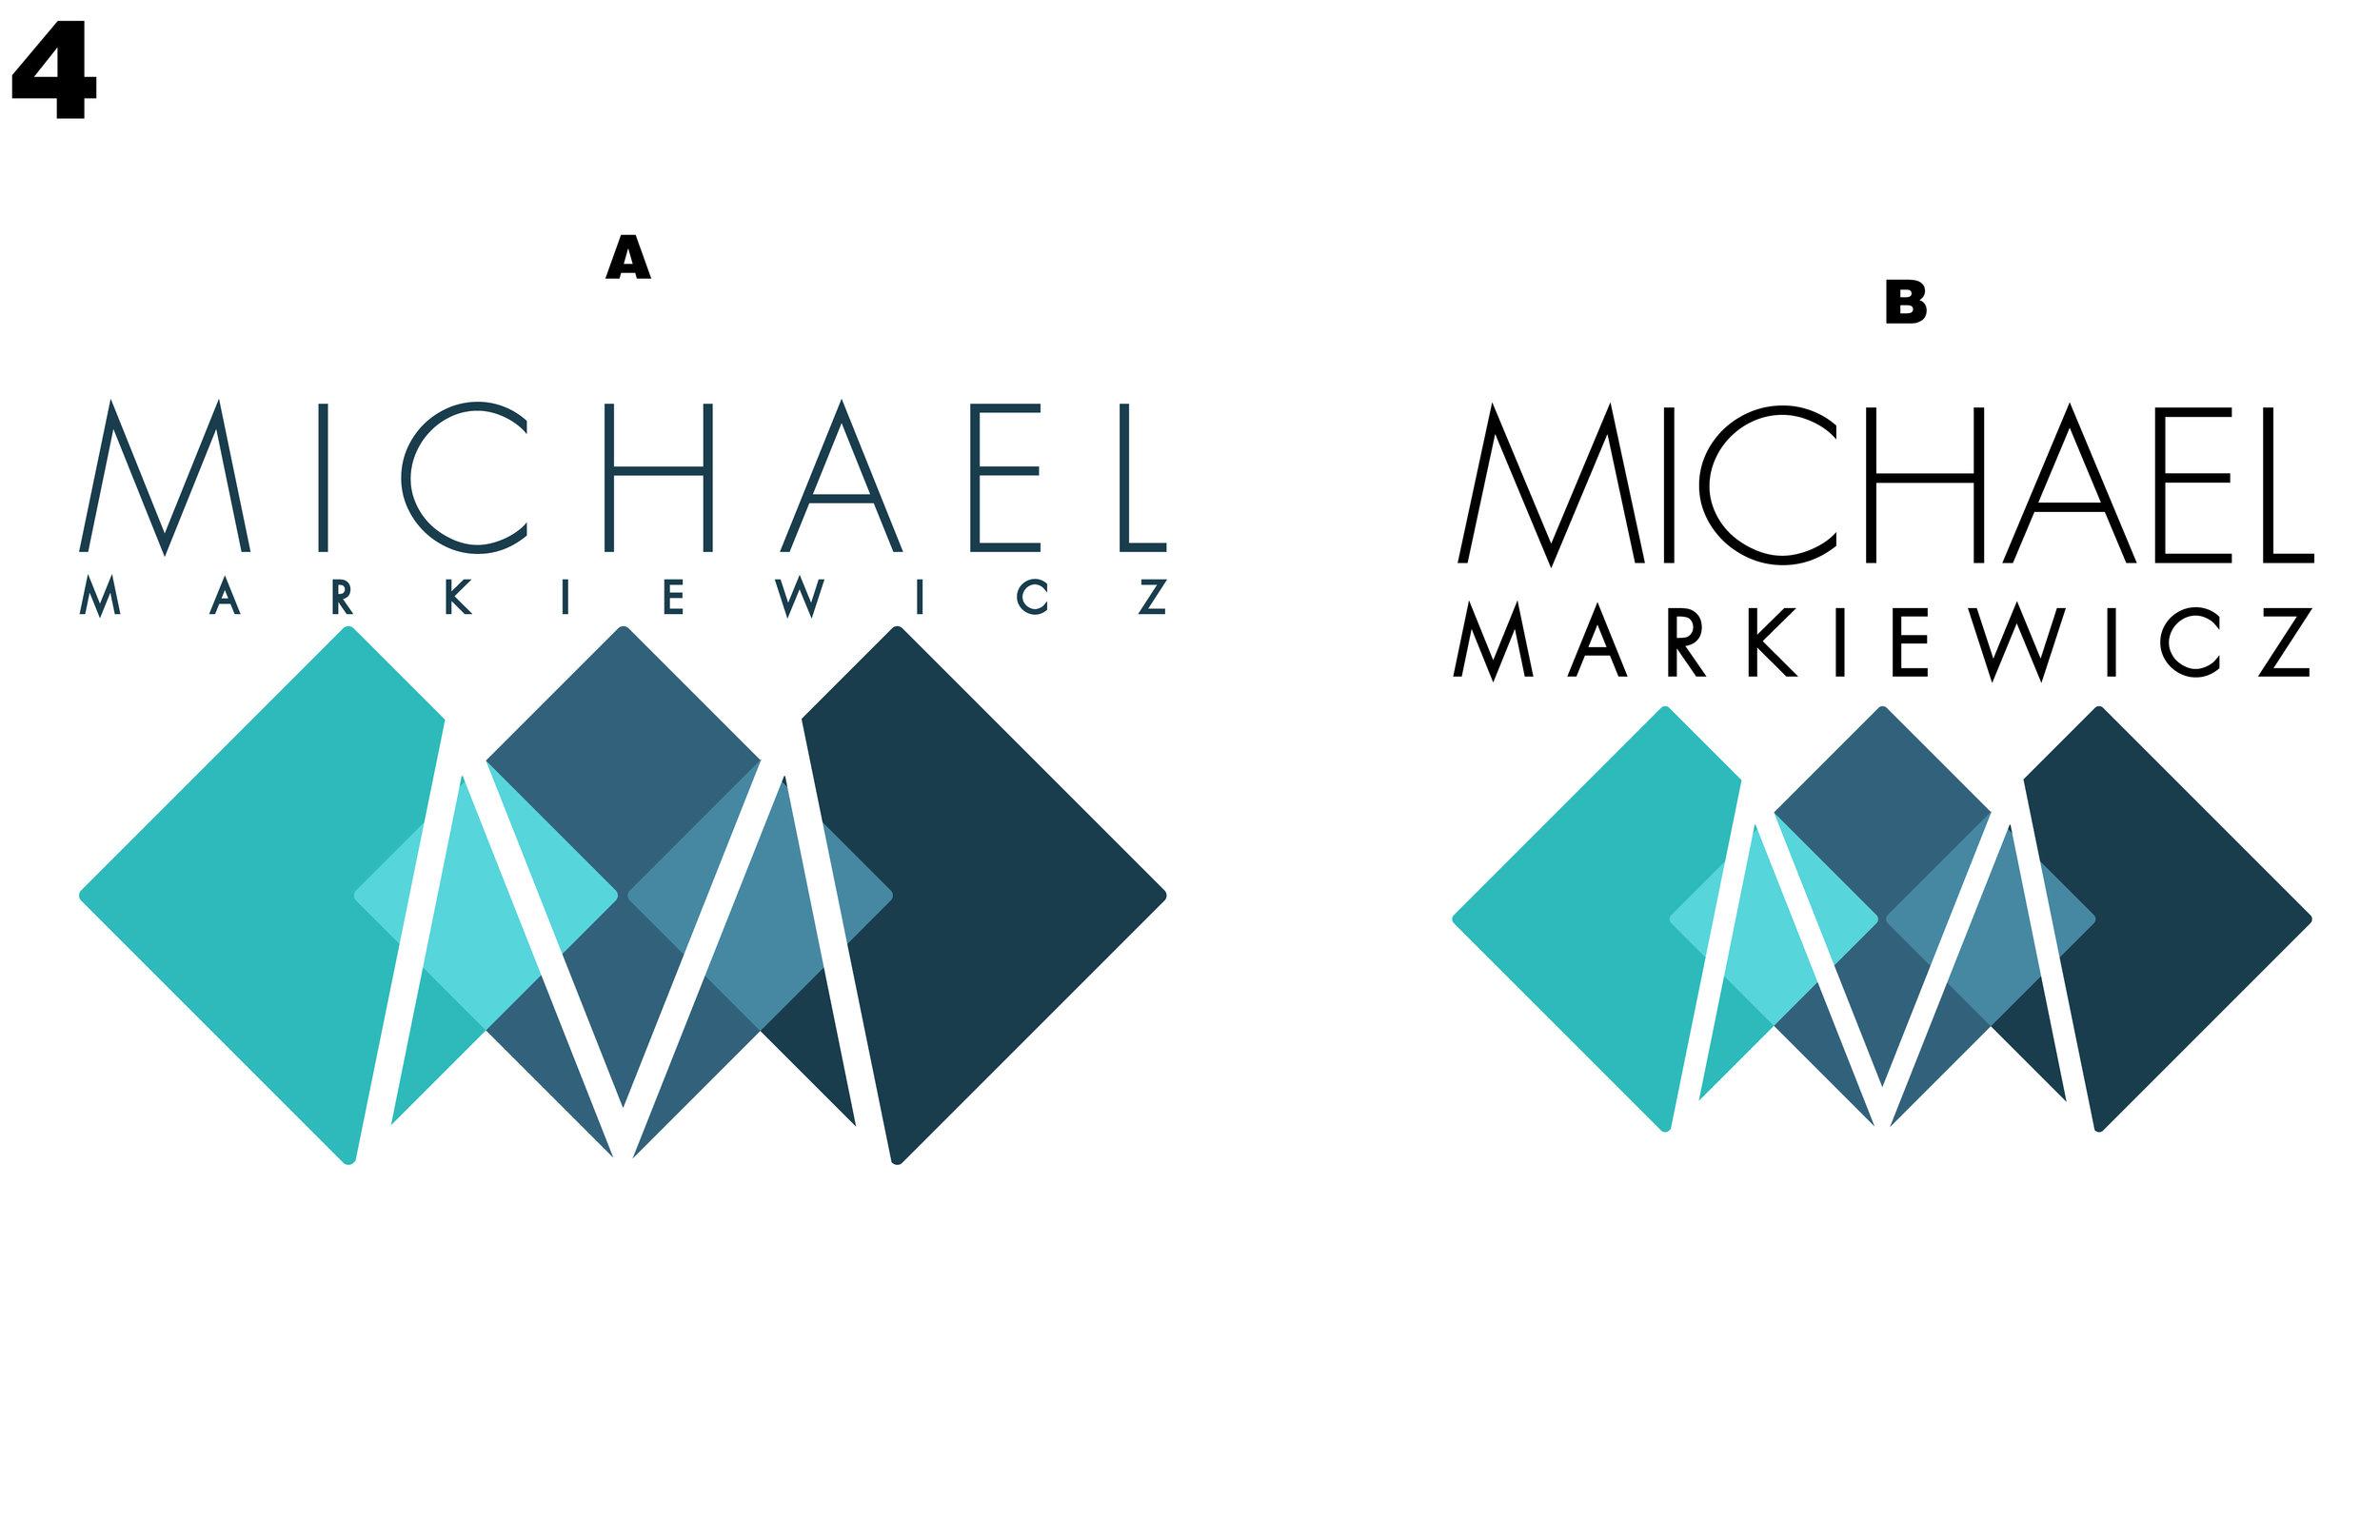 MichaelMarkiewicz-Series2-4-01.jpg